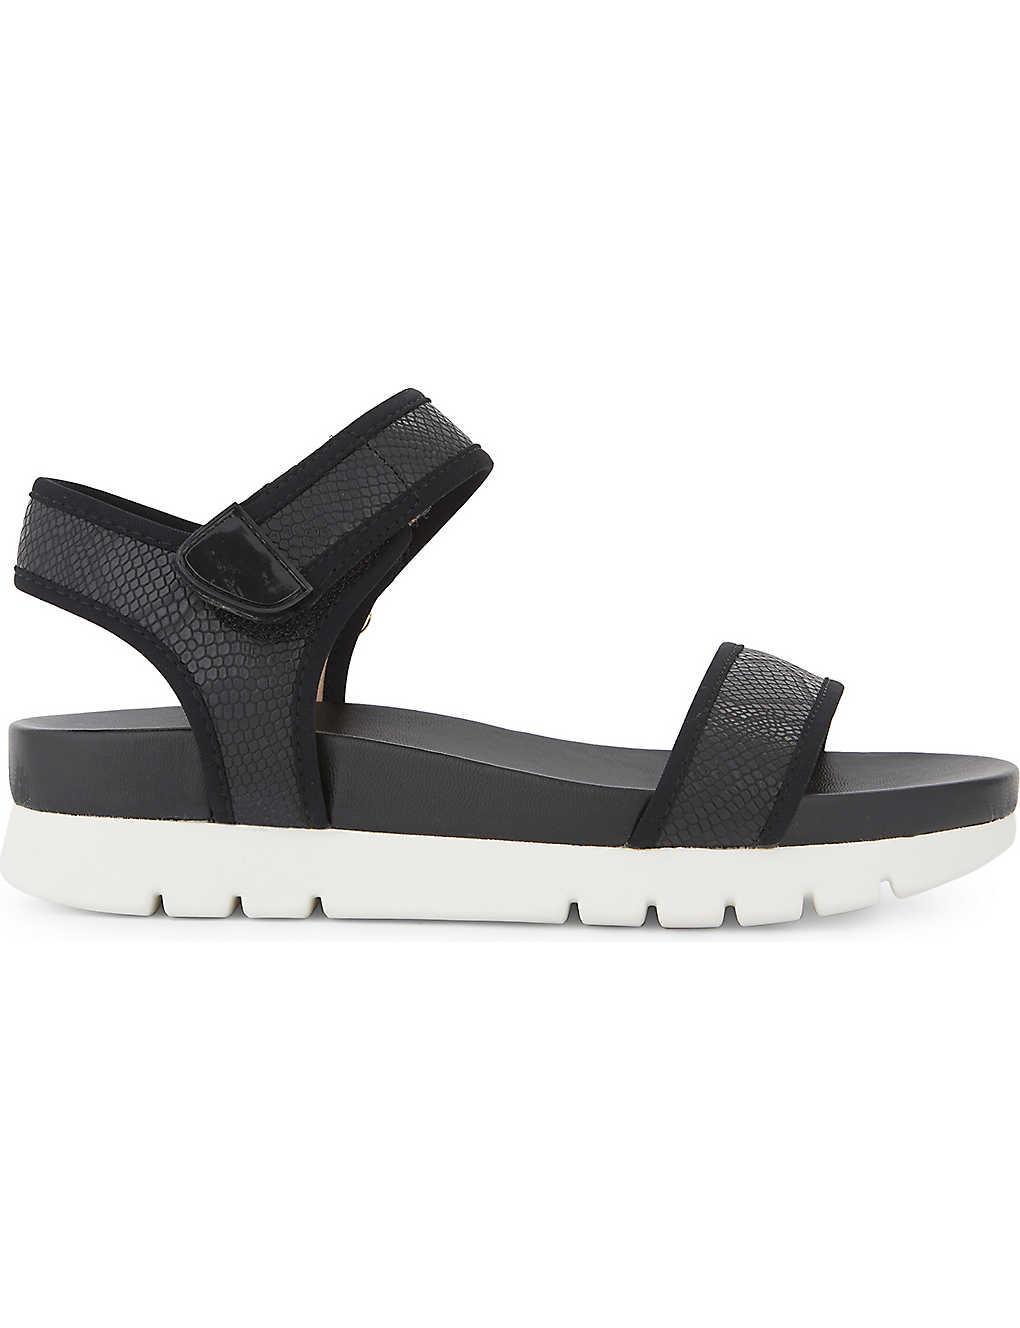 d404c2b37a3f30 ALDO - Robby flatform sandals